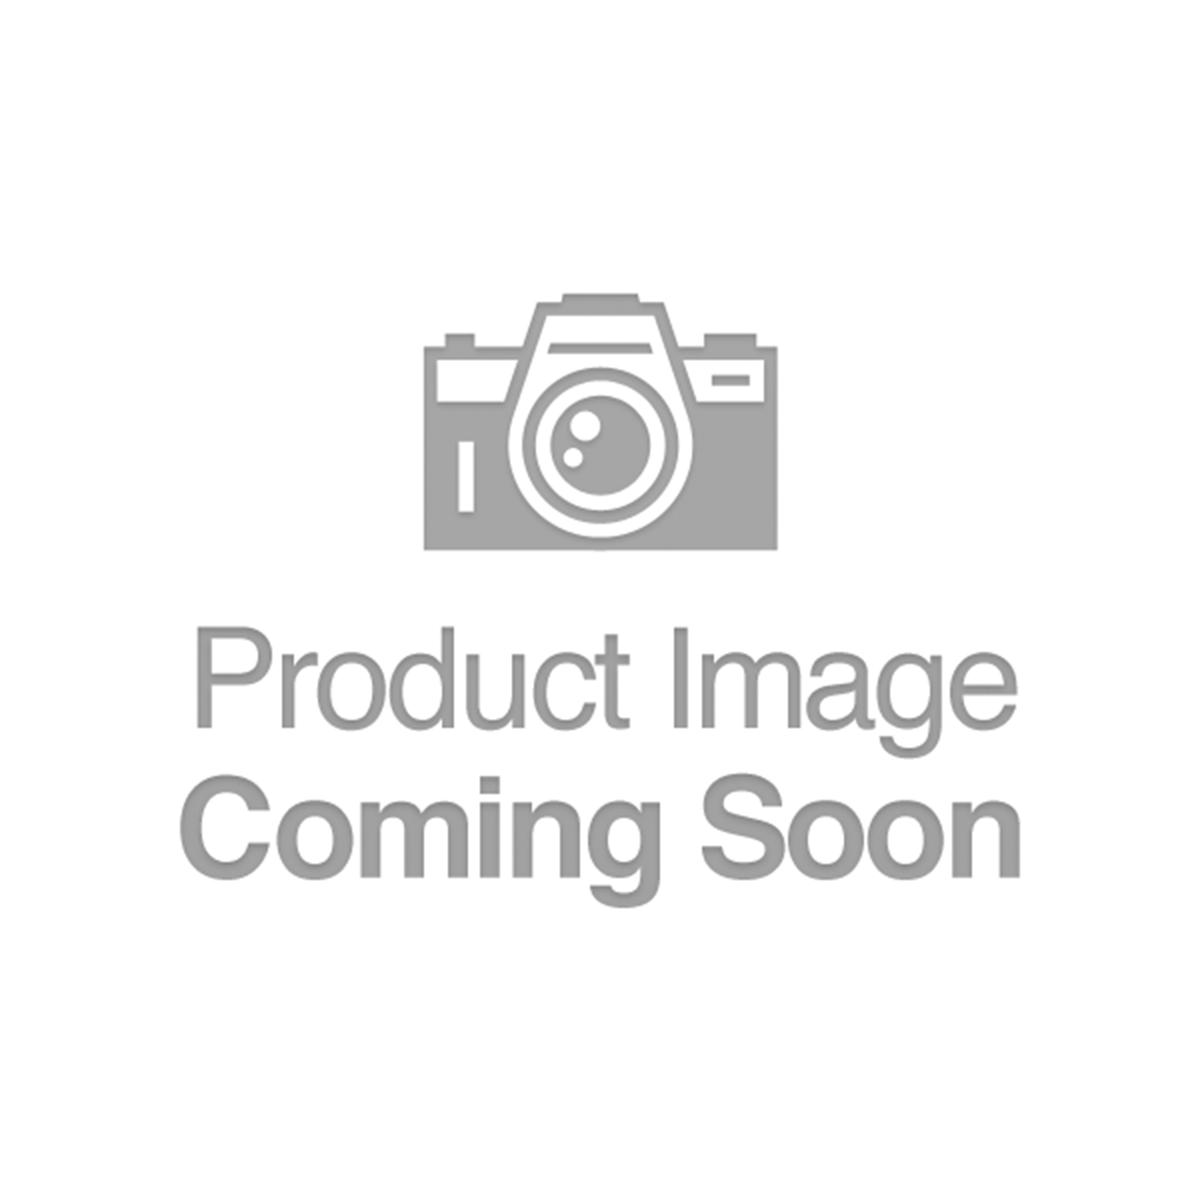 La Moure - North Dakota - CH 9714 - FR 627 - PCGS 12